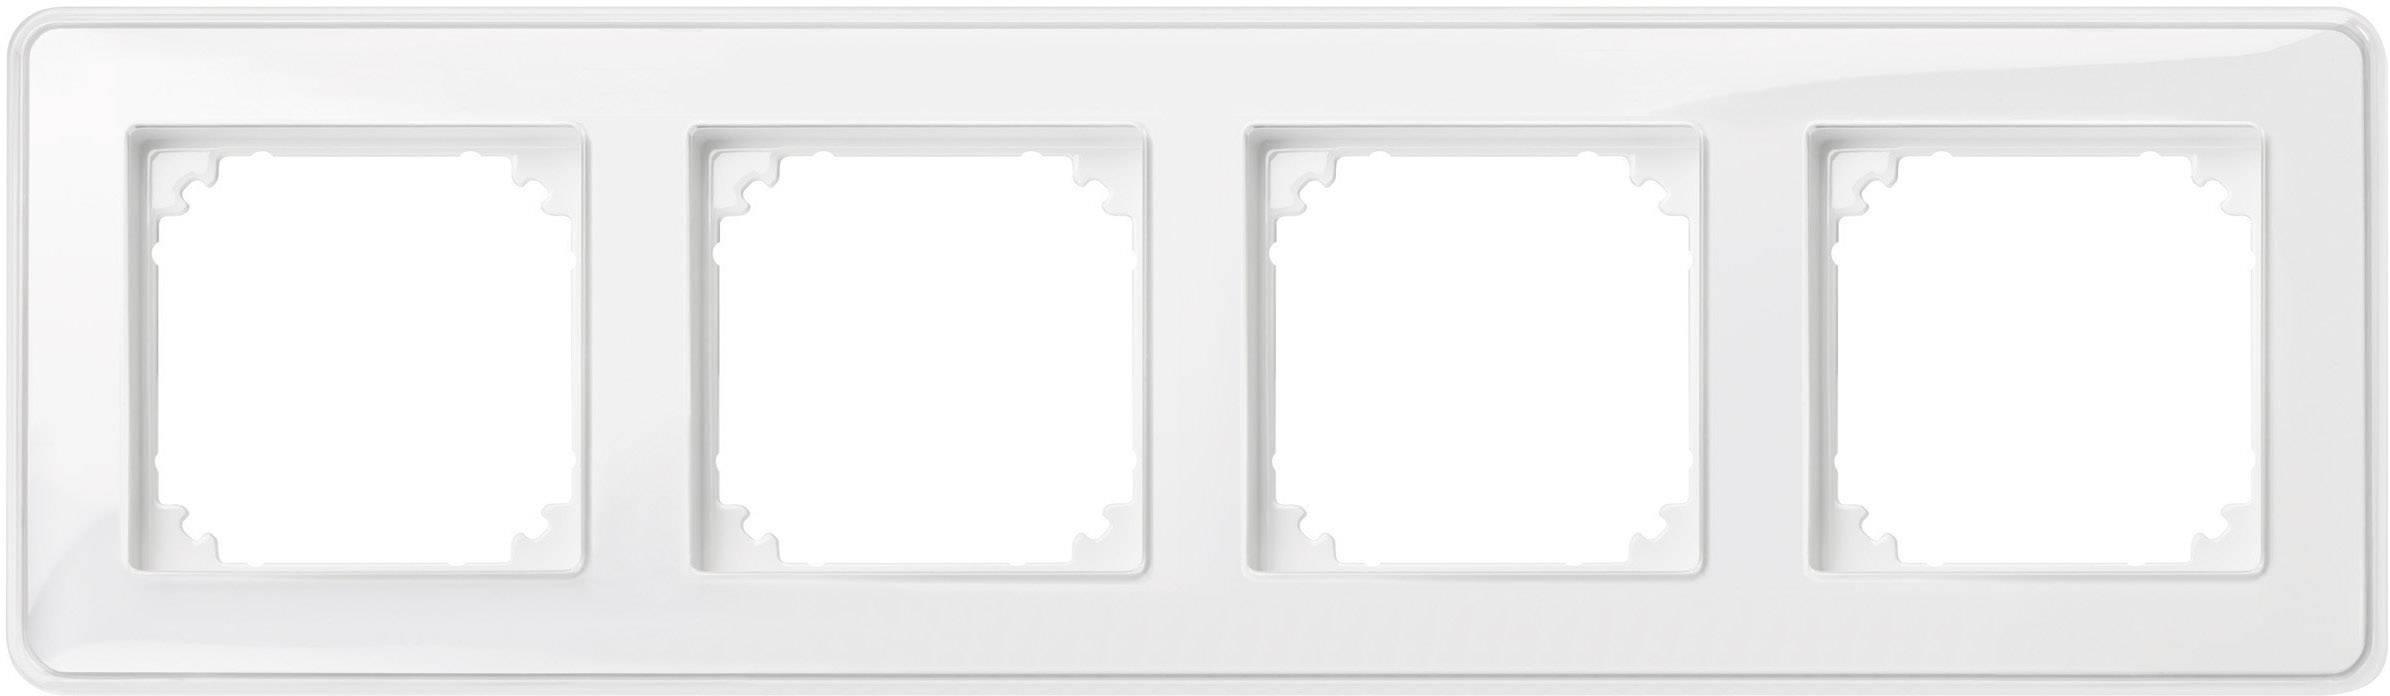 Rámeček 4násobný Merten M-Creativ, polární bílá (MEG4040-3500)